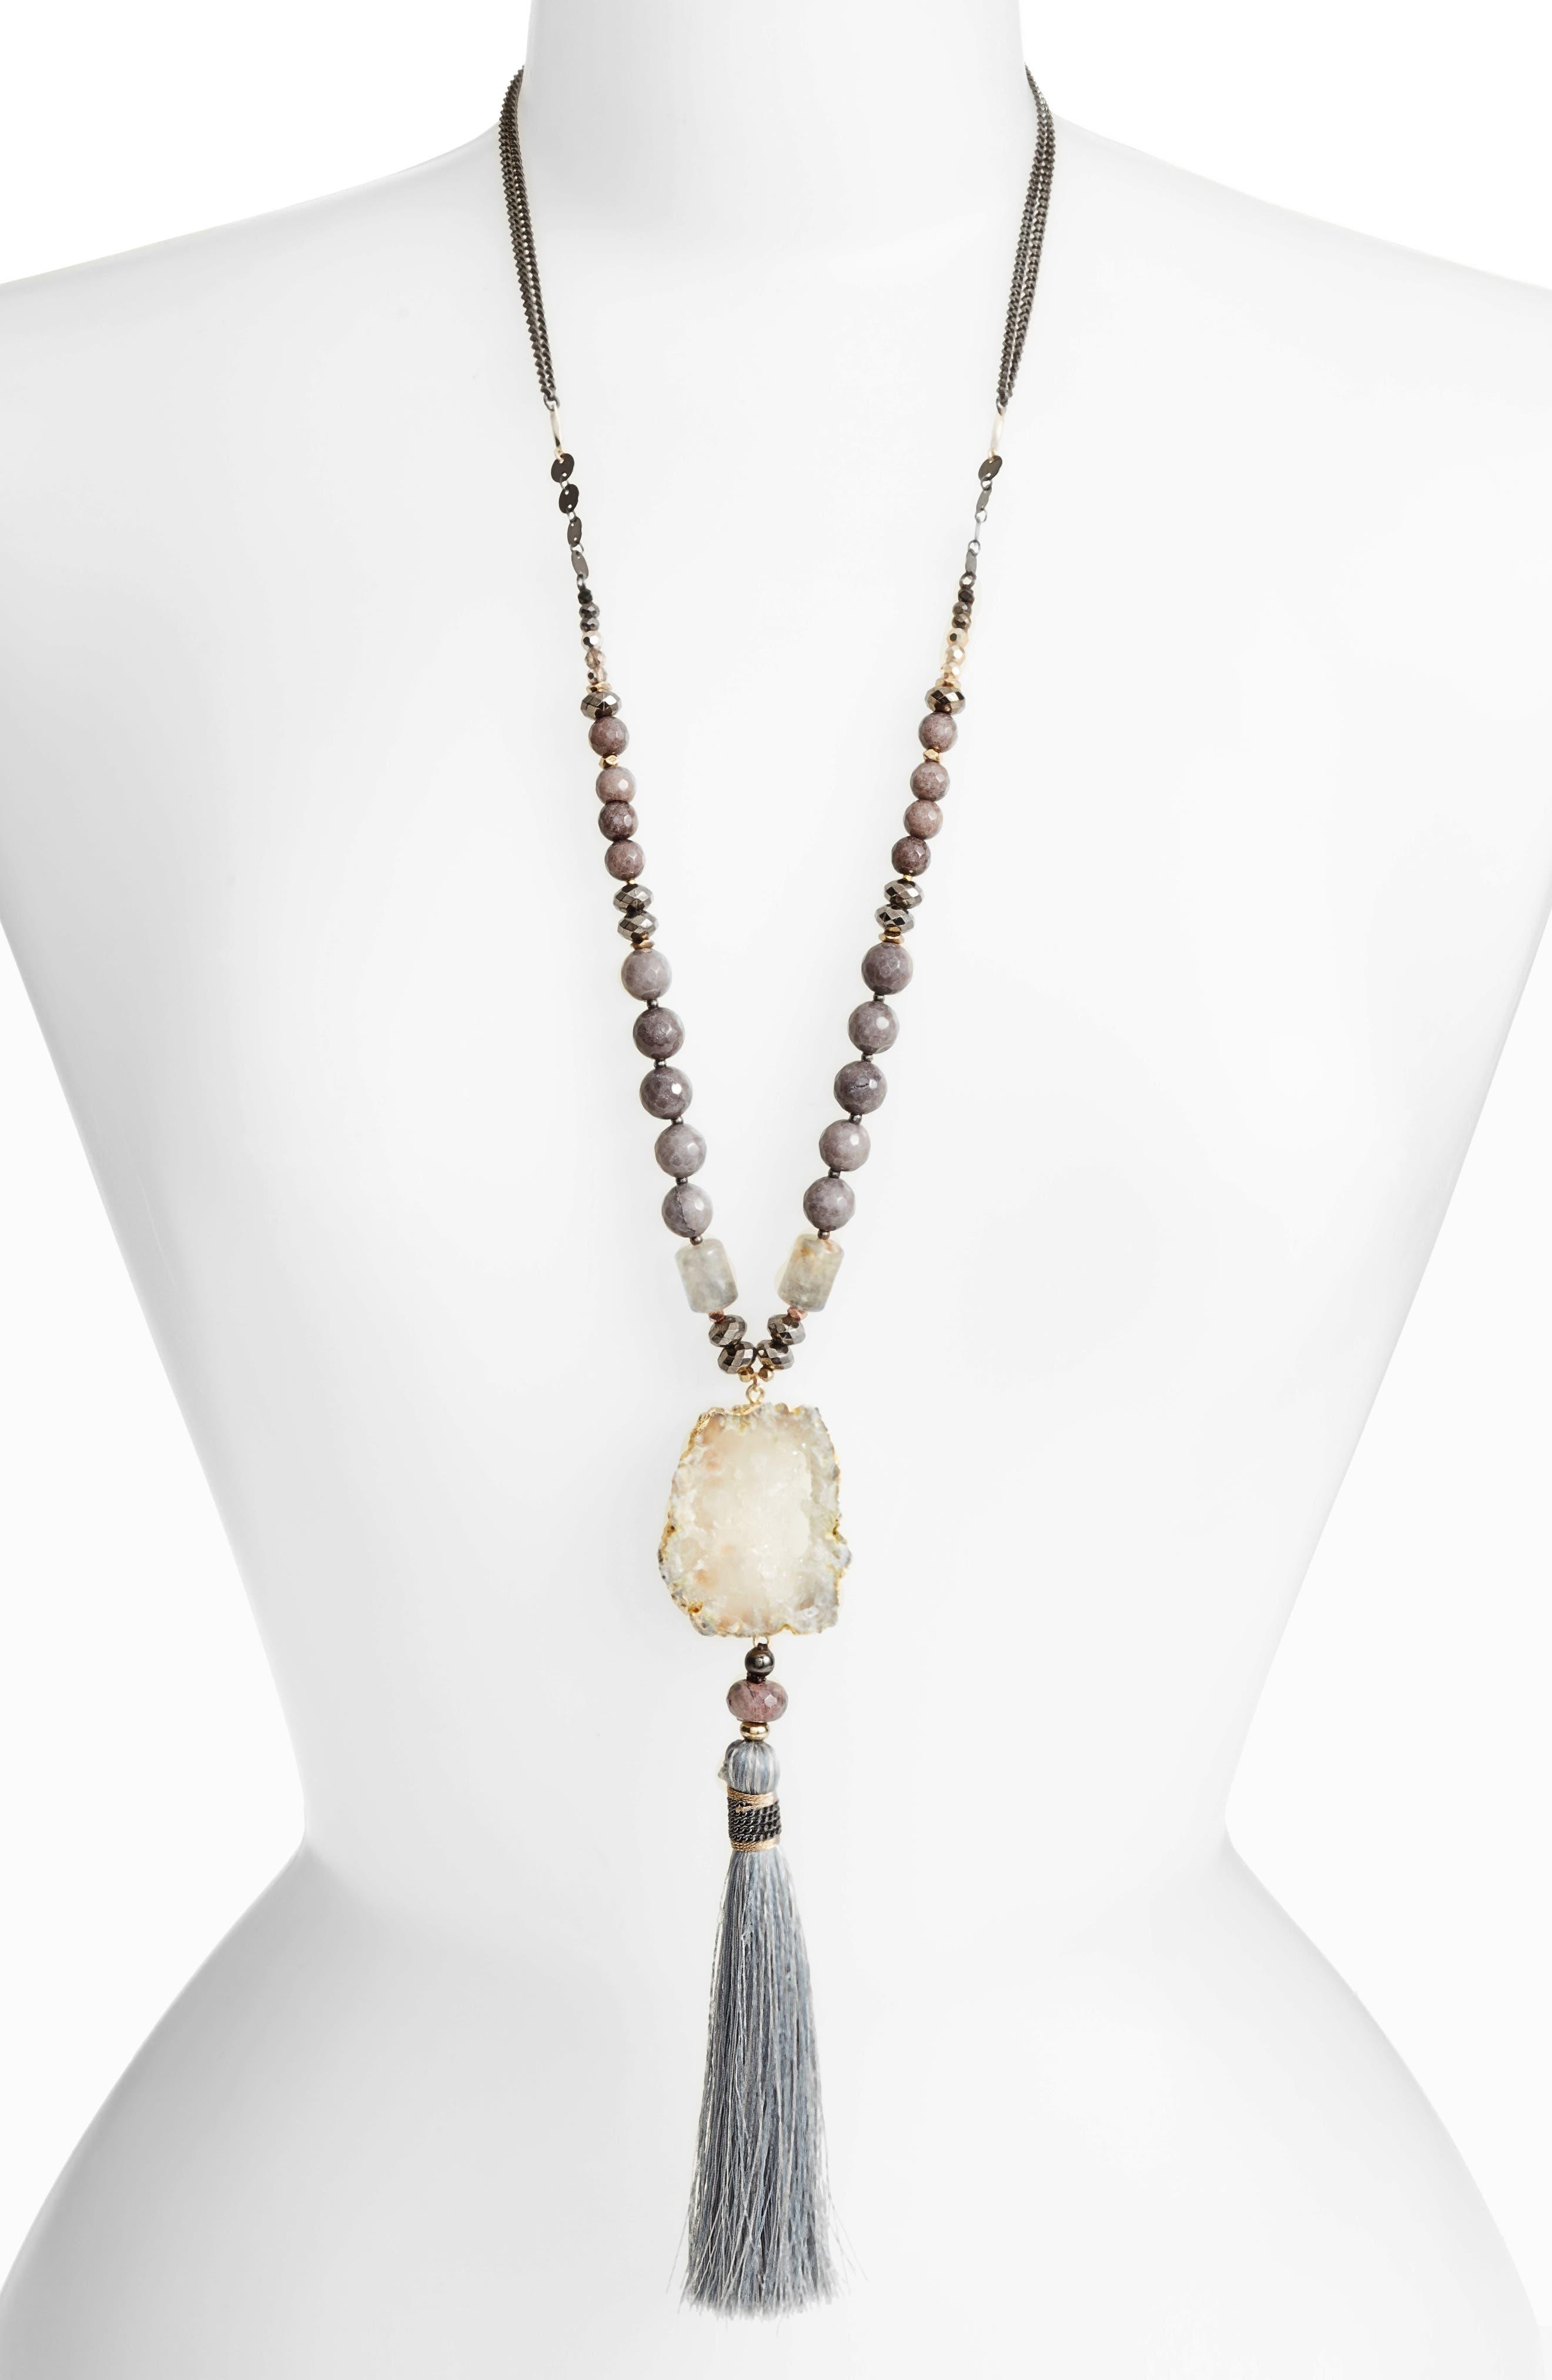 Nakamol Design Agate Pendant Tassel Necklace